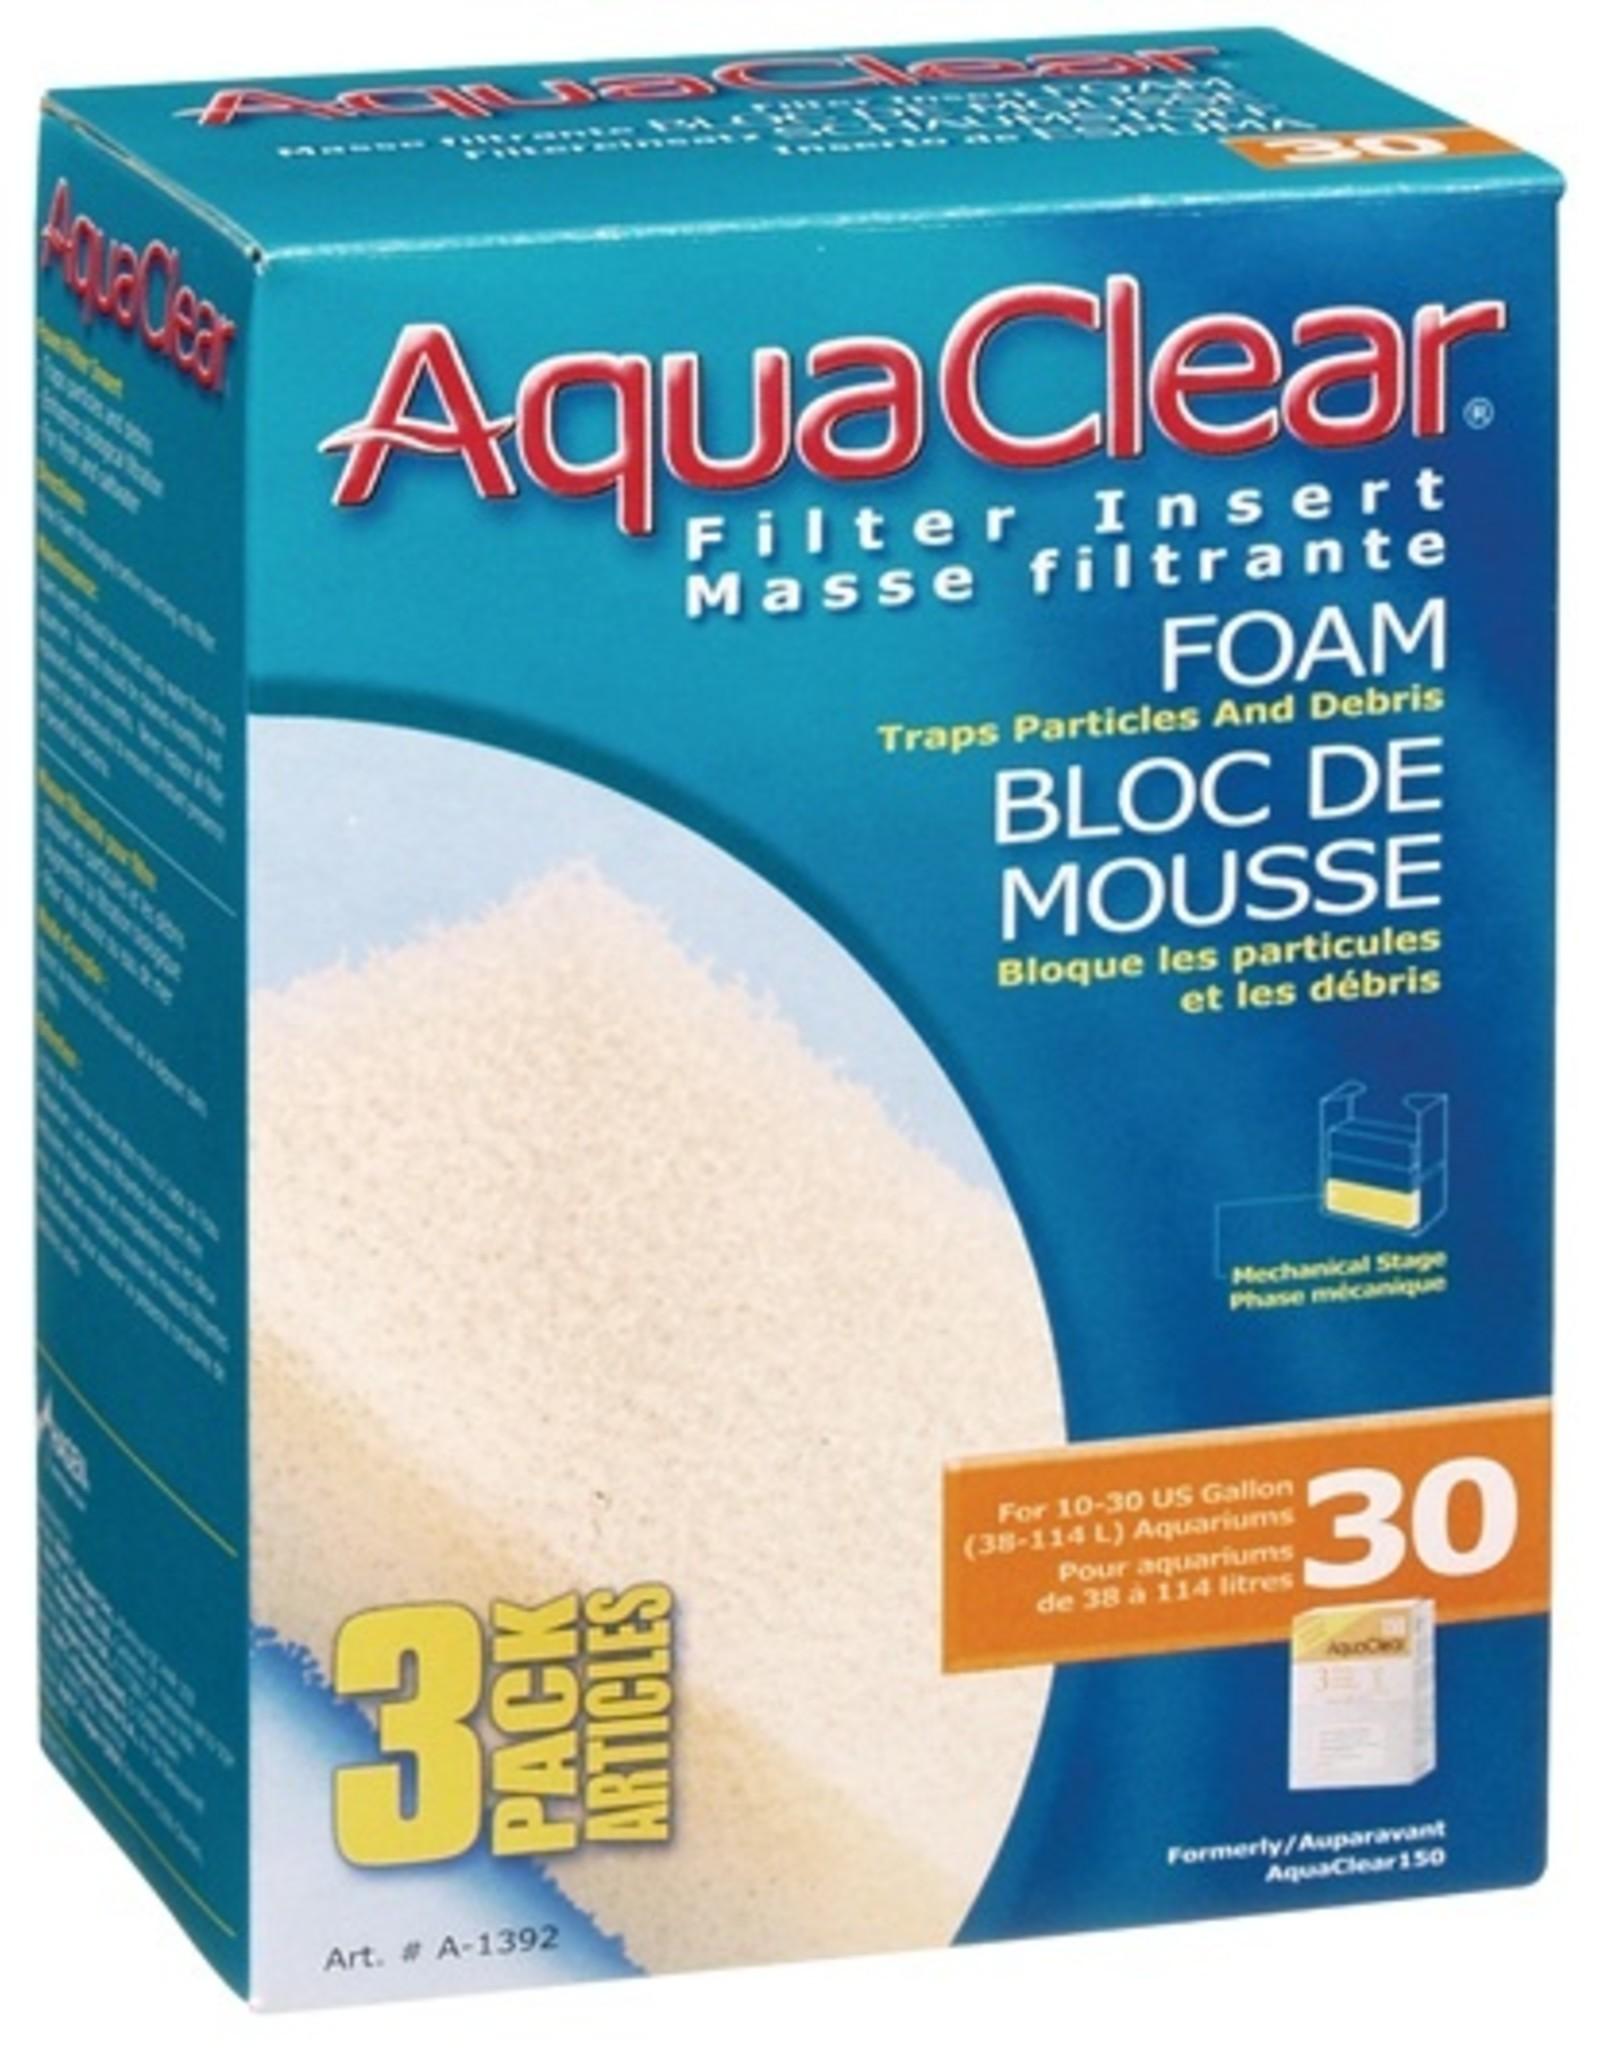 HAGEN AQUA CLEAR 30 3PK FOAM